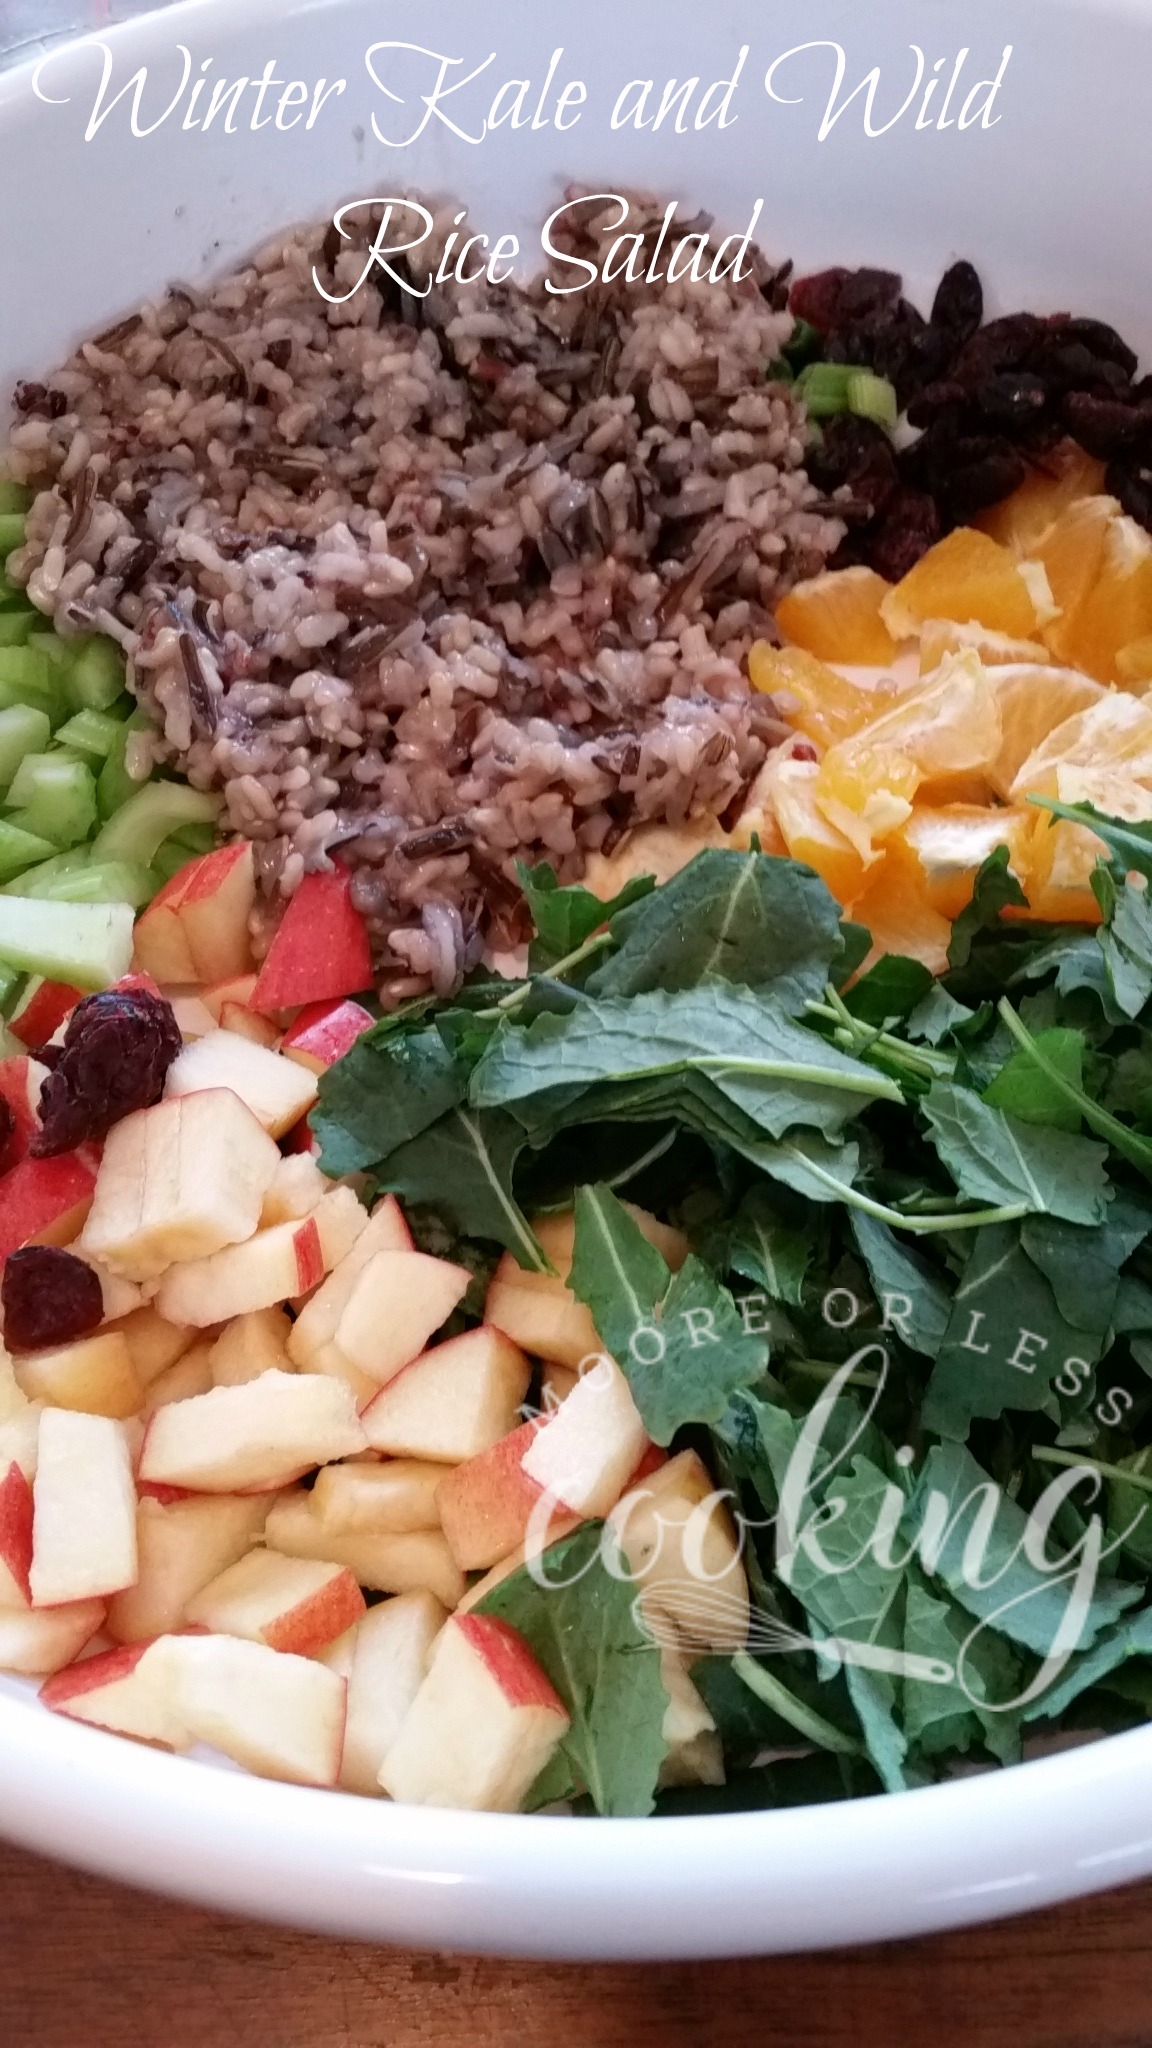 Winter Kale and Wild Rice Salad